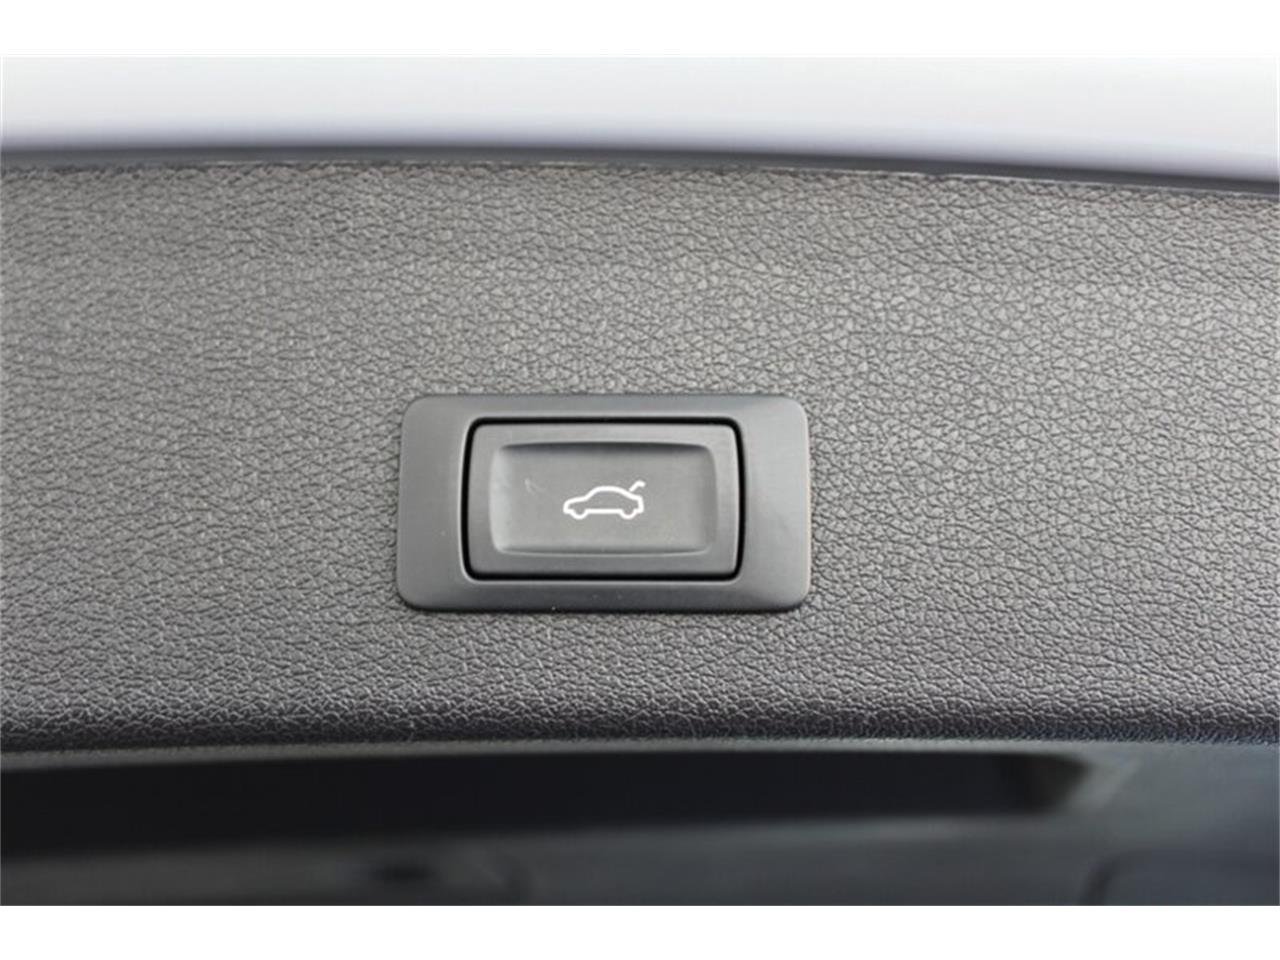 2014 Audi Q5 (CC-1254082) for sale in Sherman Oaks, California